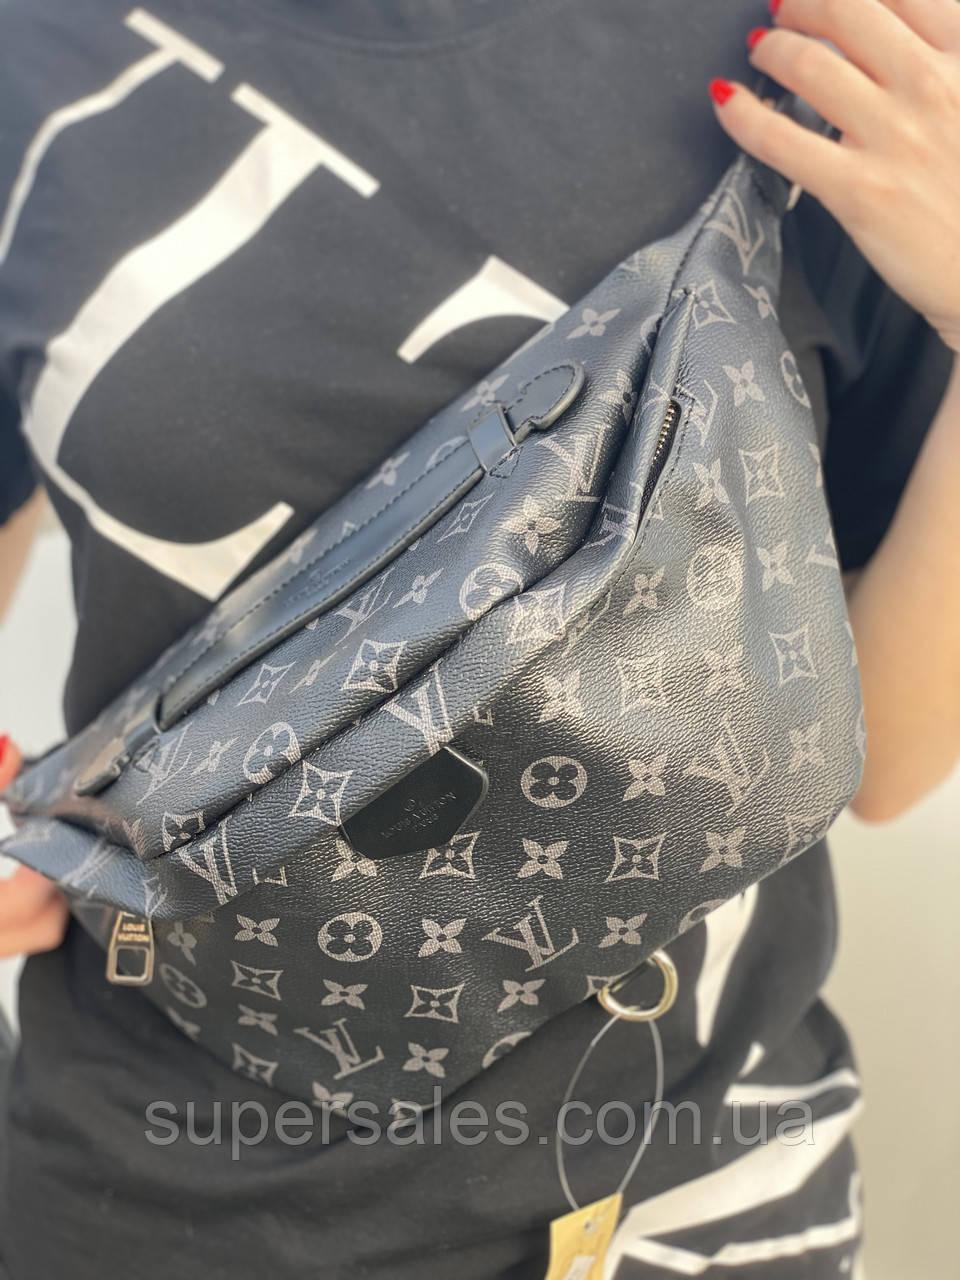 Сумка на пояс бананка Louis Vuitton Луи Виттон, поясная сумка черная с серым